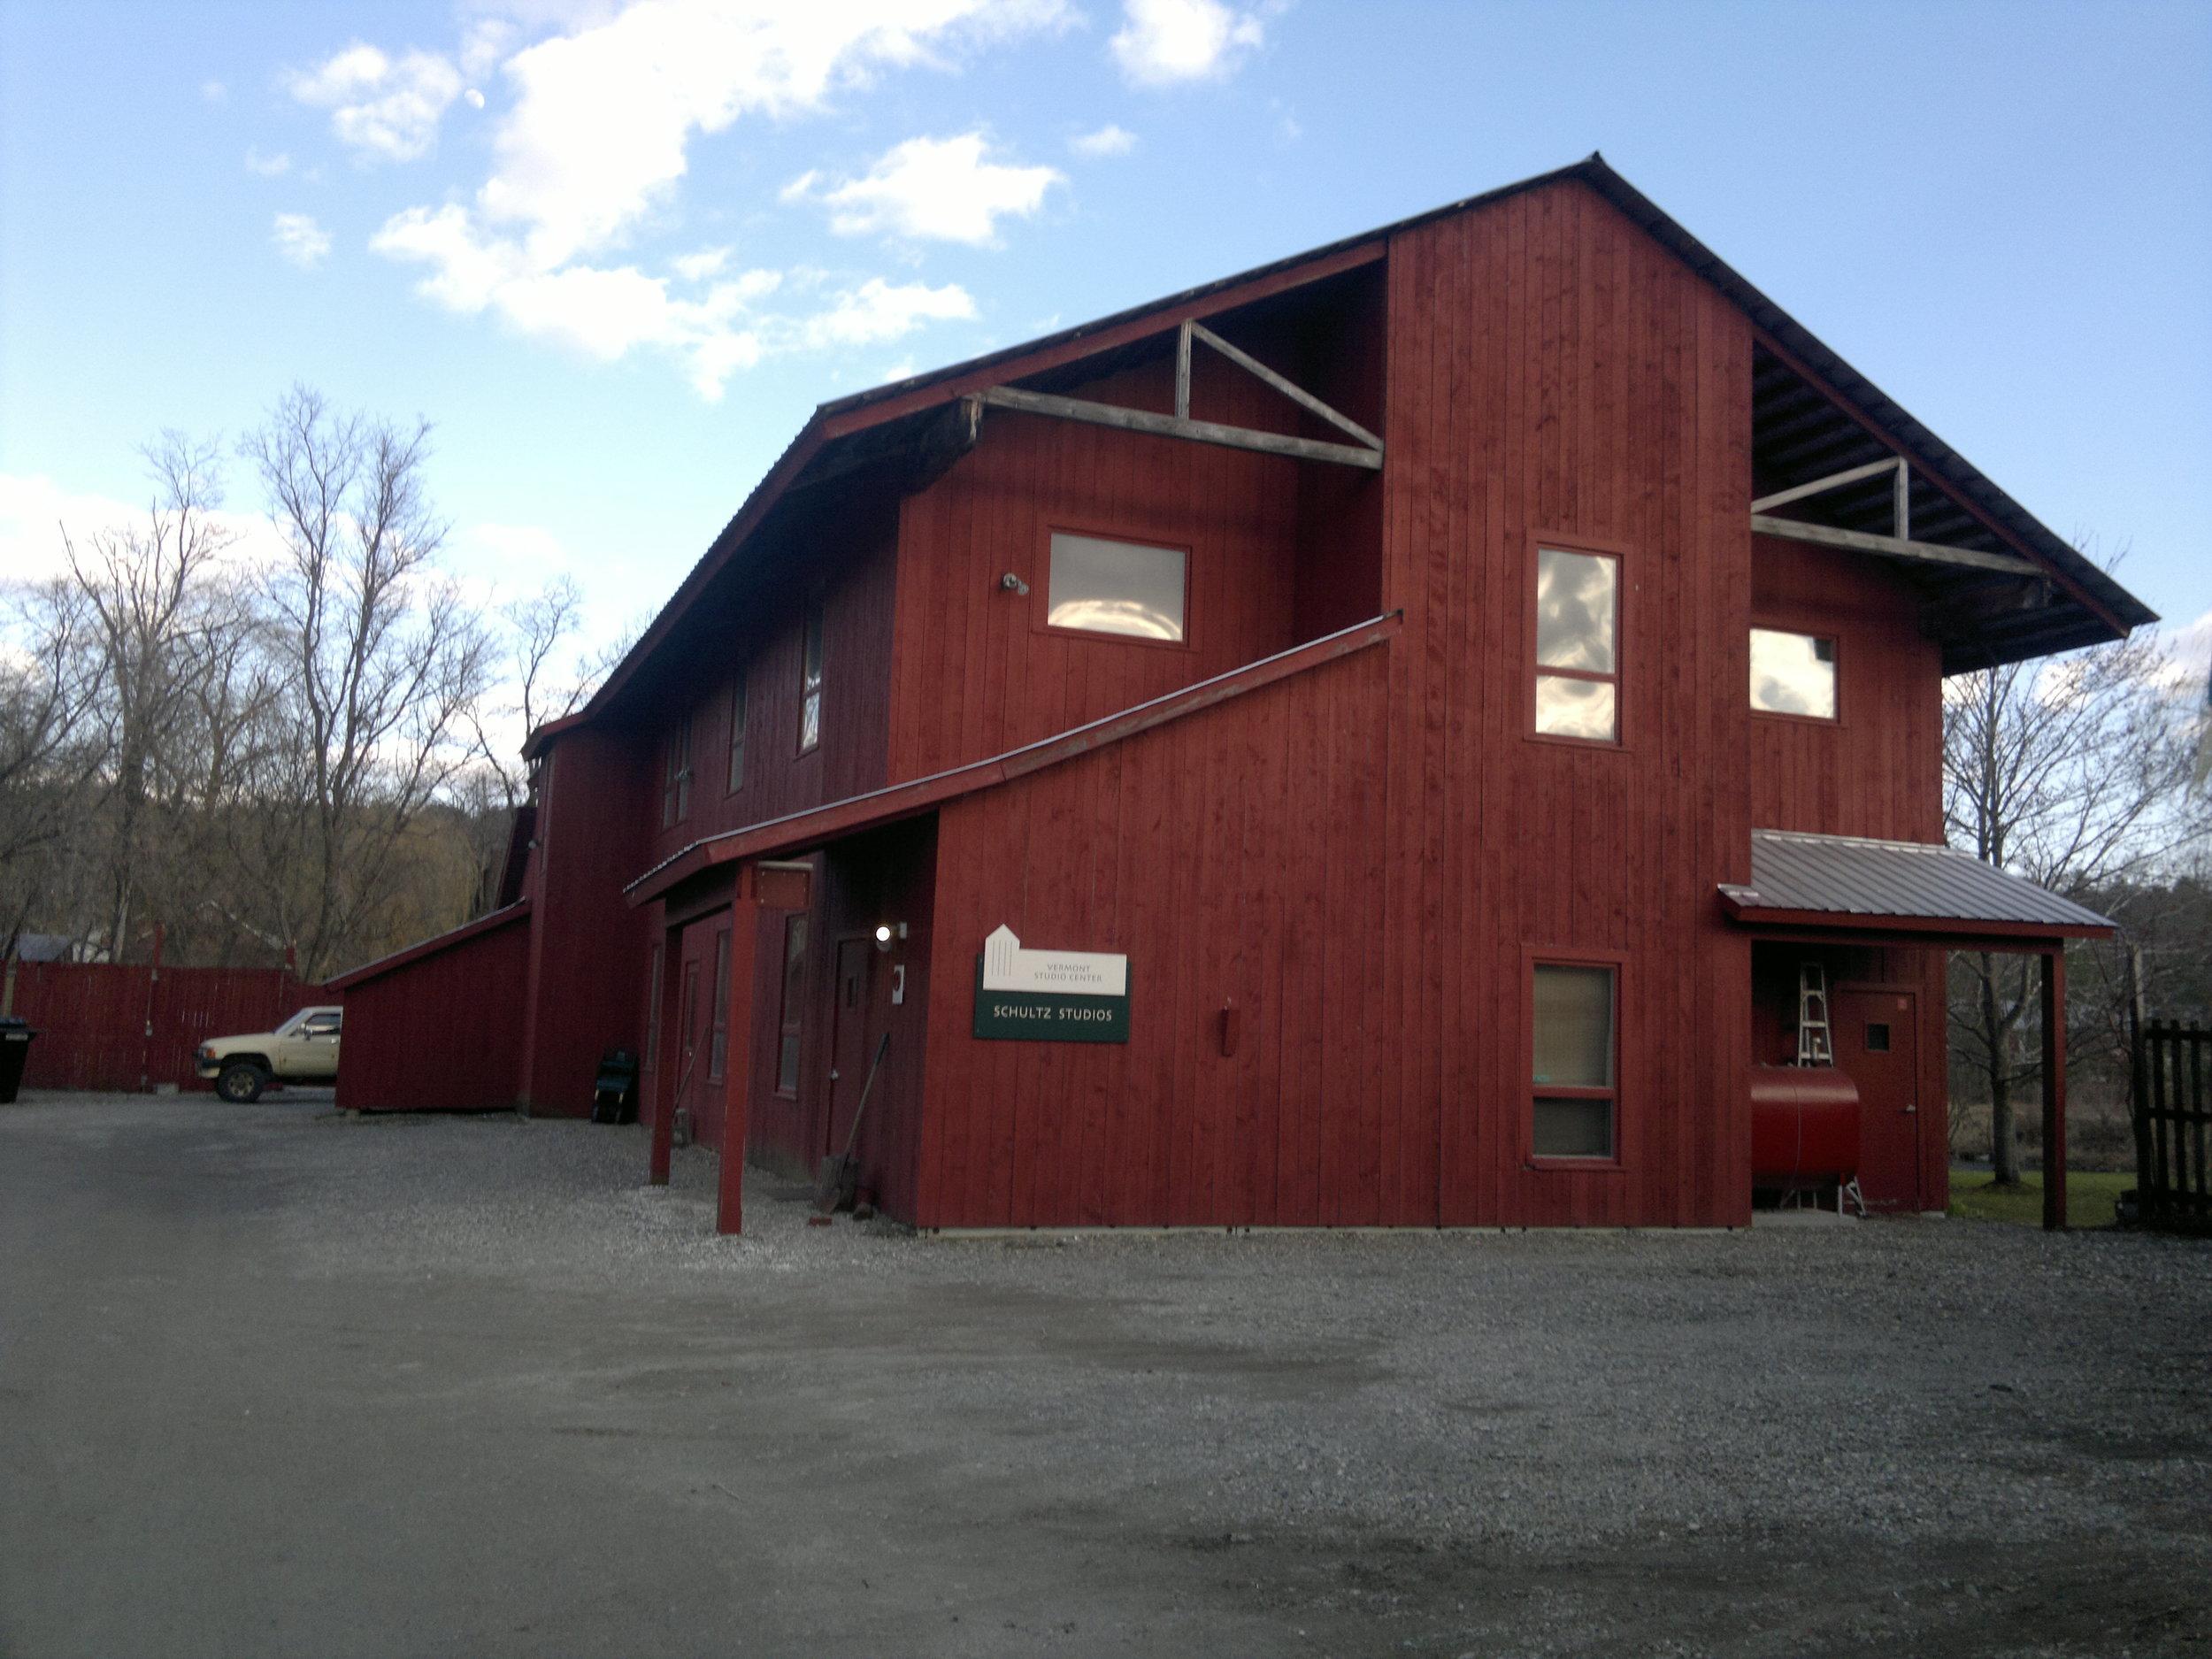 The Schultz sculpture studios